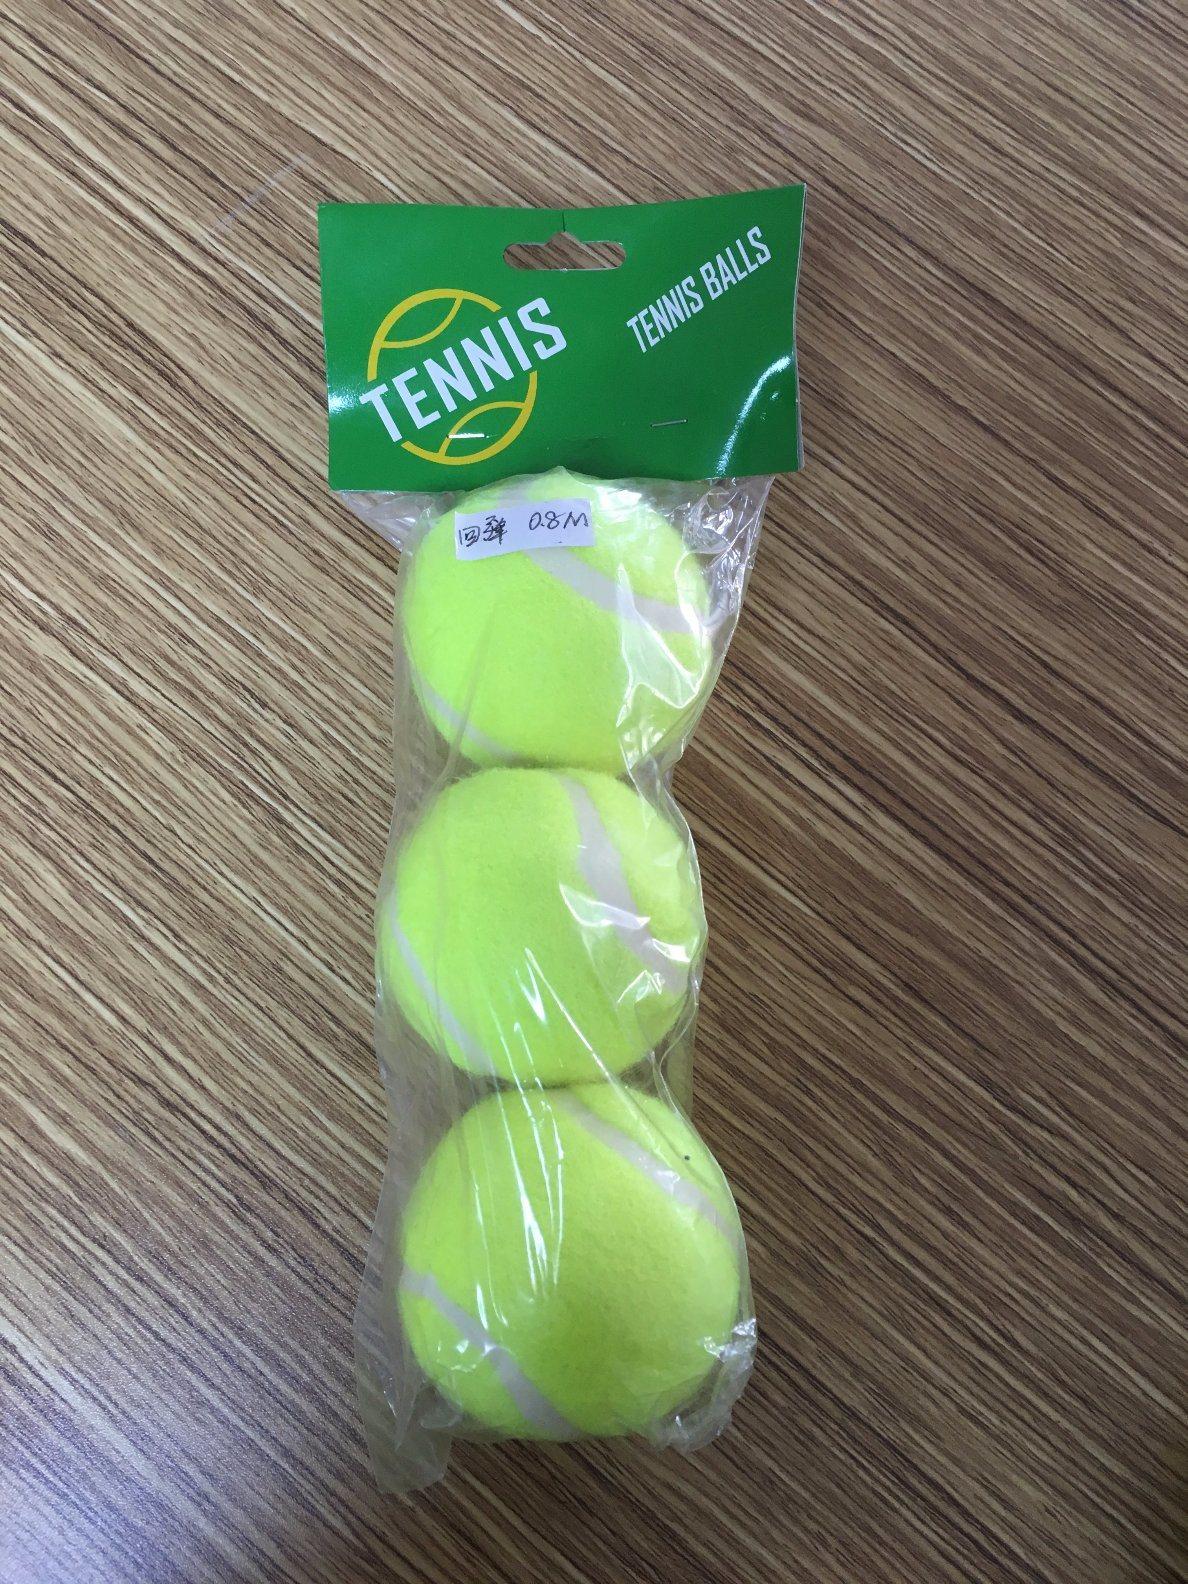 3PCS Plastic Bag Packing Yellow Tennis Traing Ball